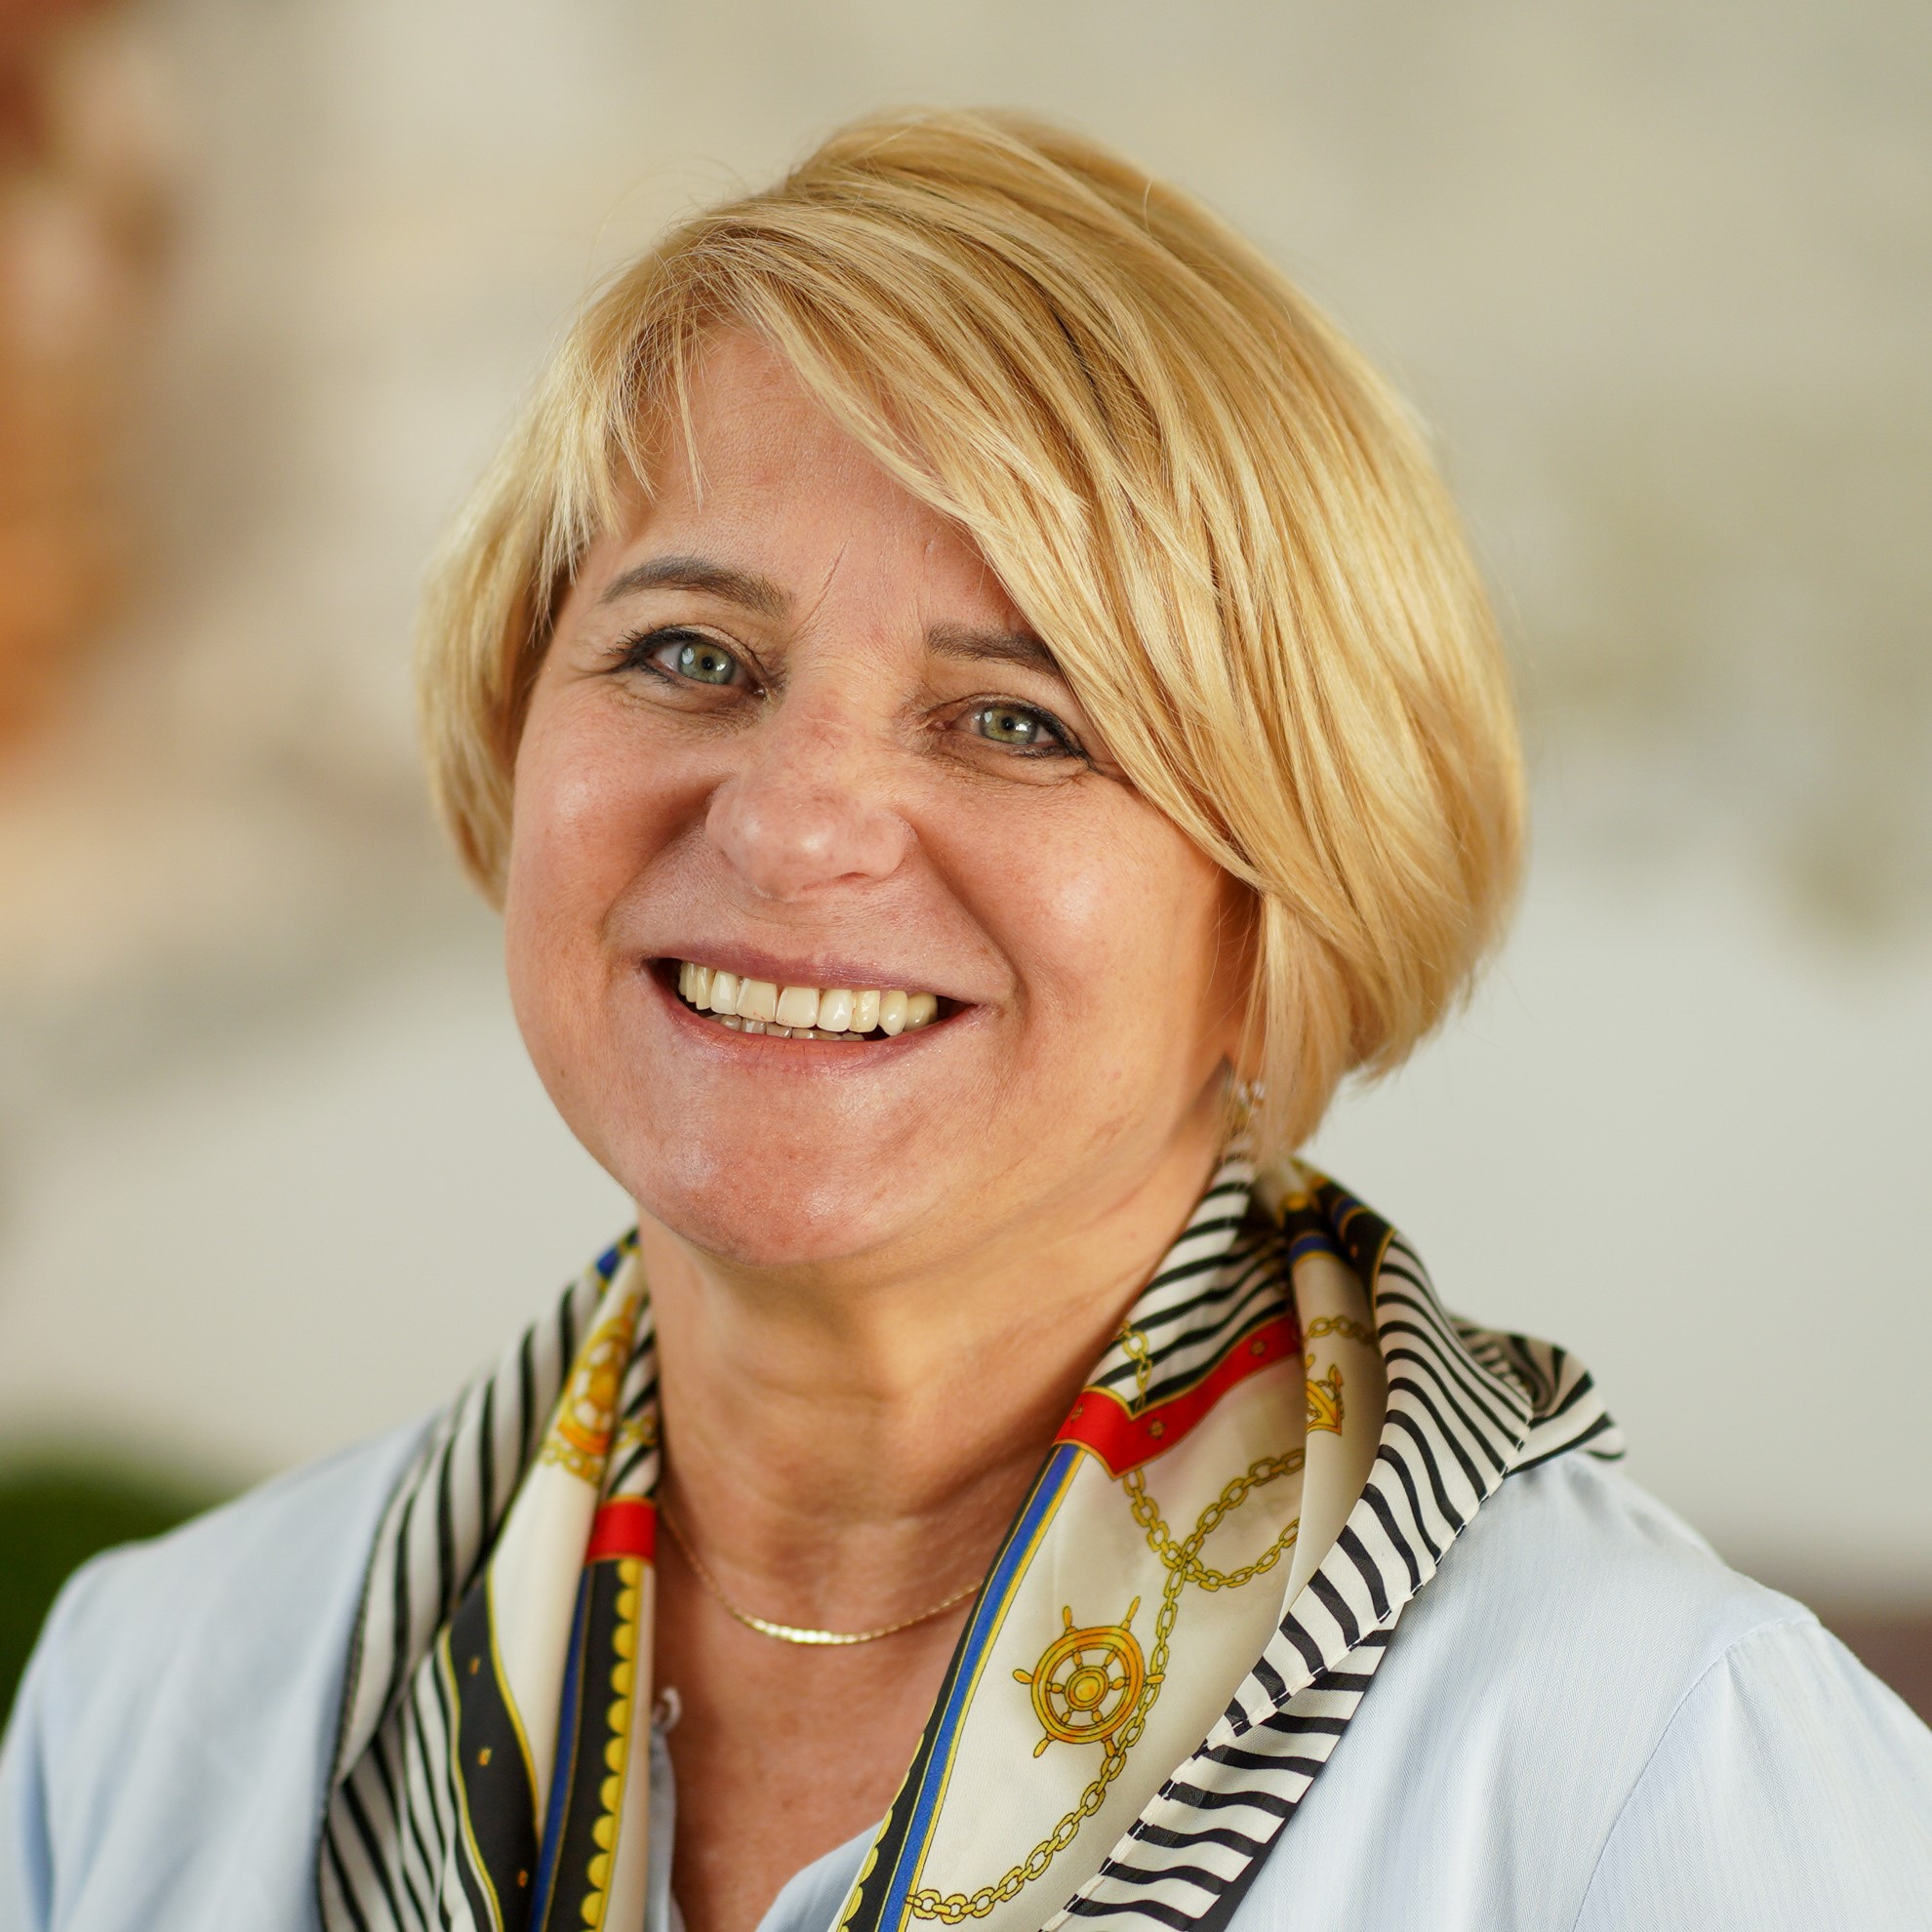 http://akademia.prodialog.pl/wp-content/uploads/2020/05/Barbara-Basińska.jpg